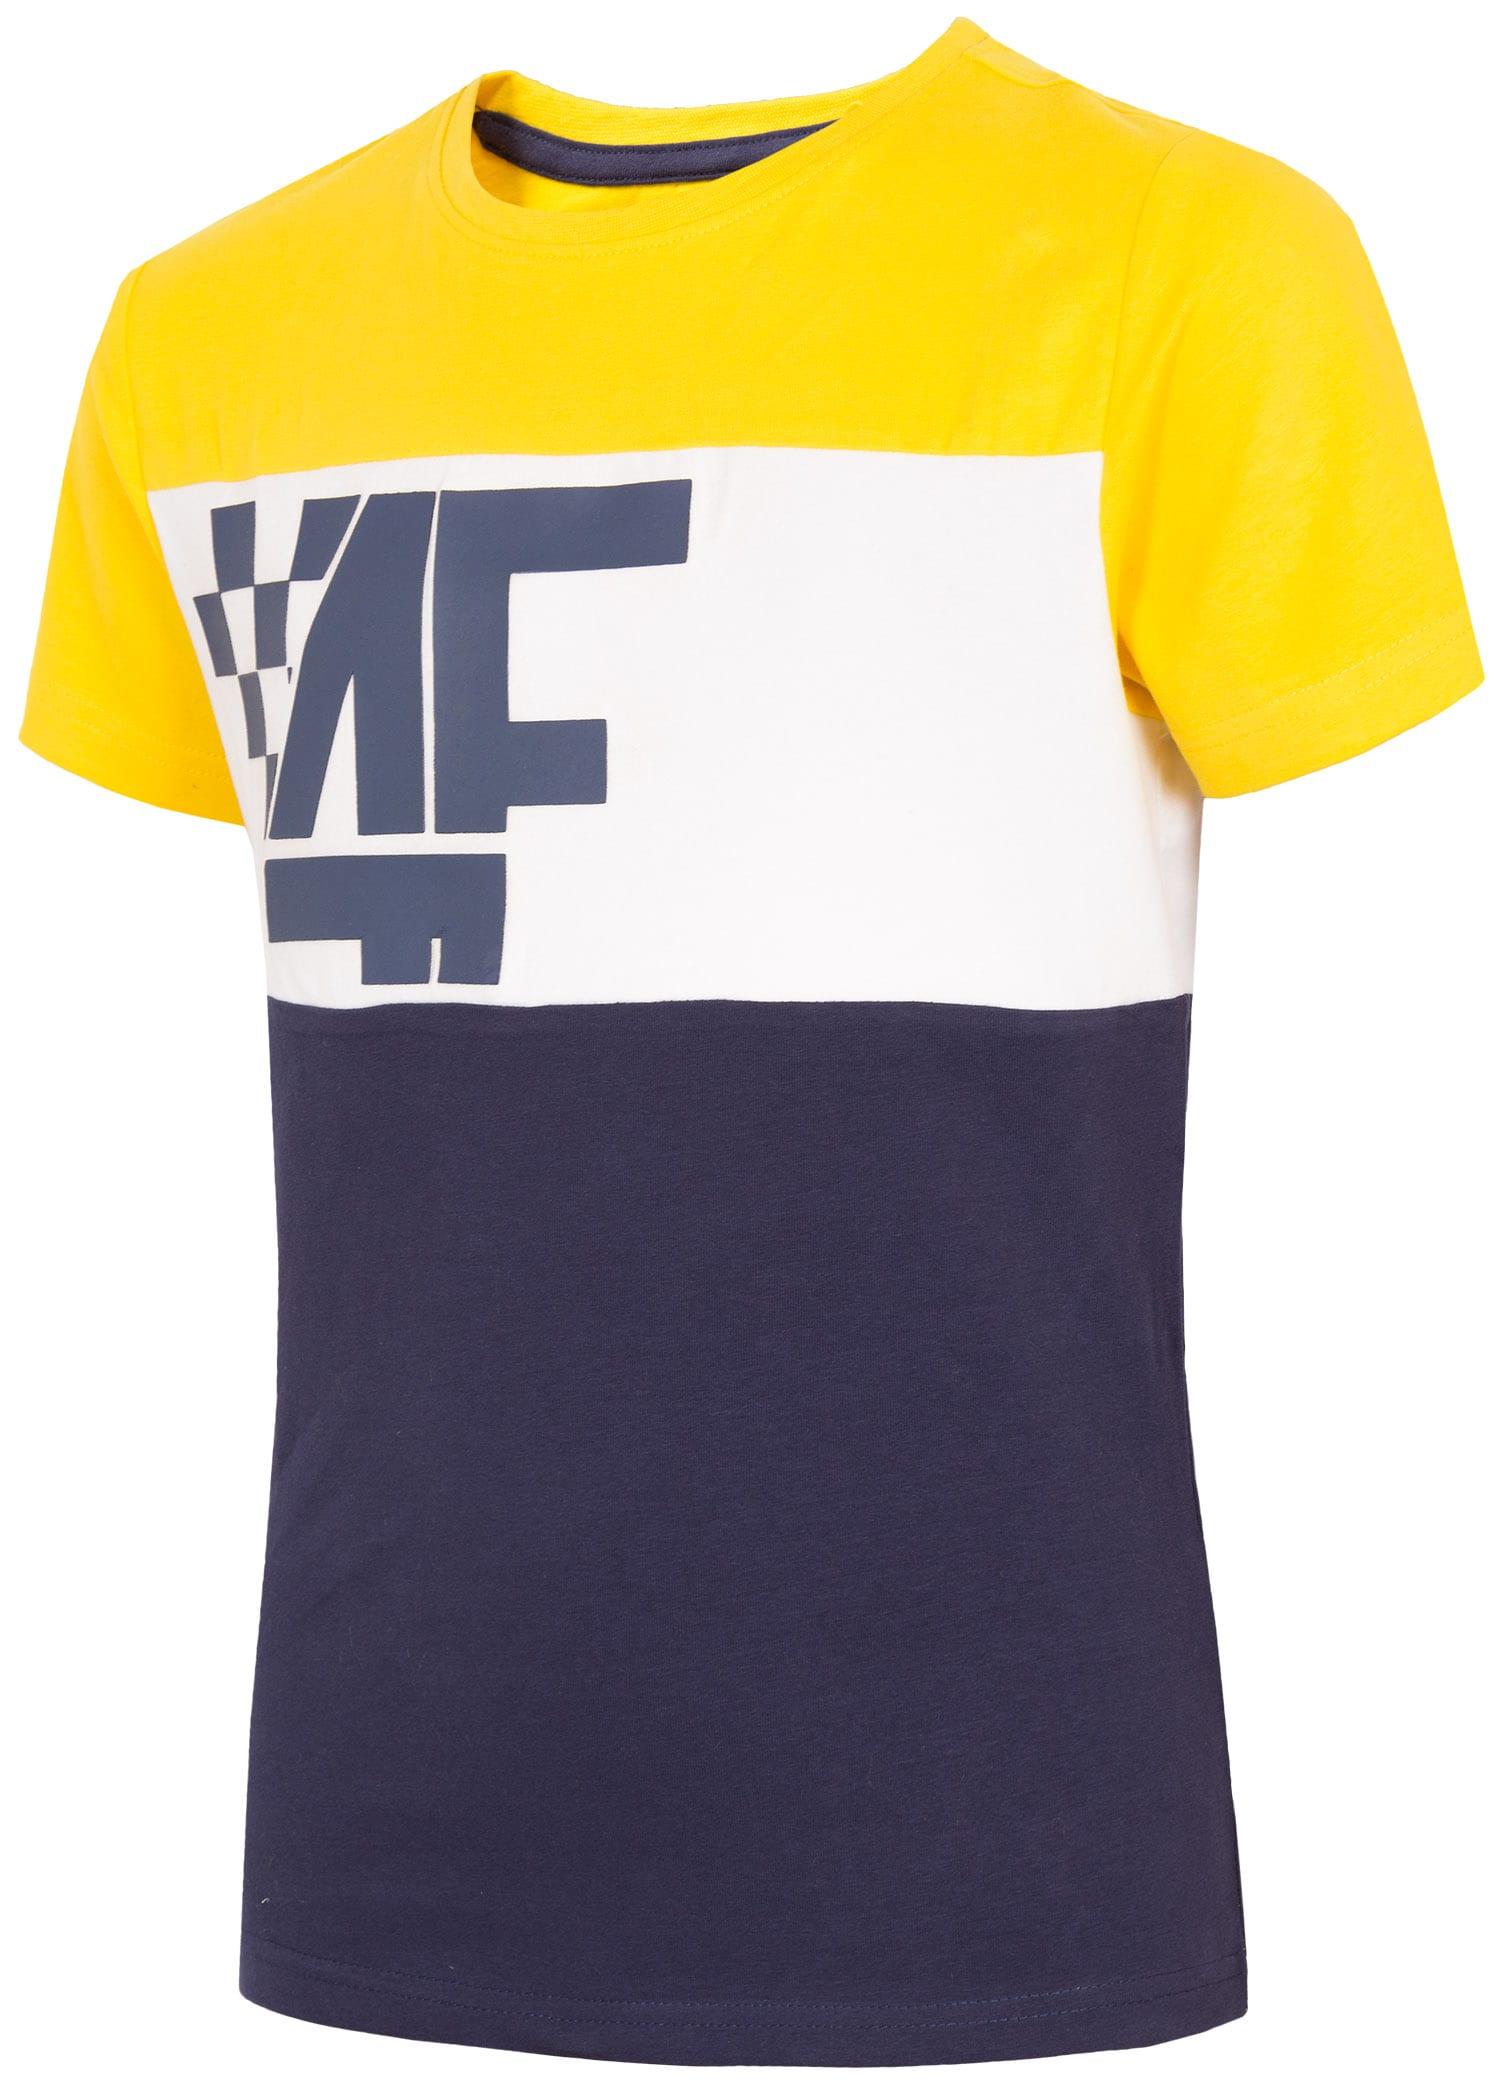 d1dd6757d Kupić.pl - 4F - T-shirt chłopięcy (122-164) JTSM206A - żółty